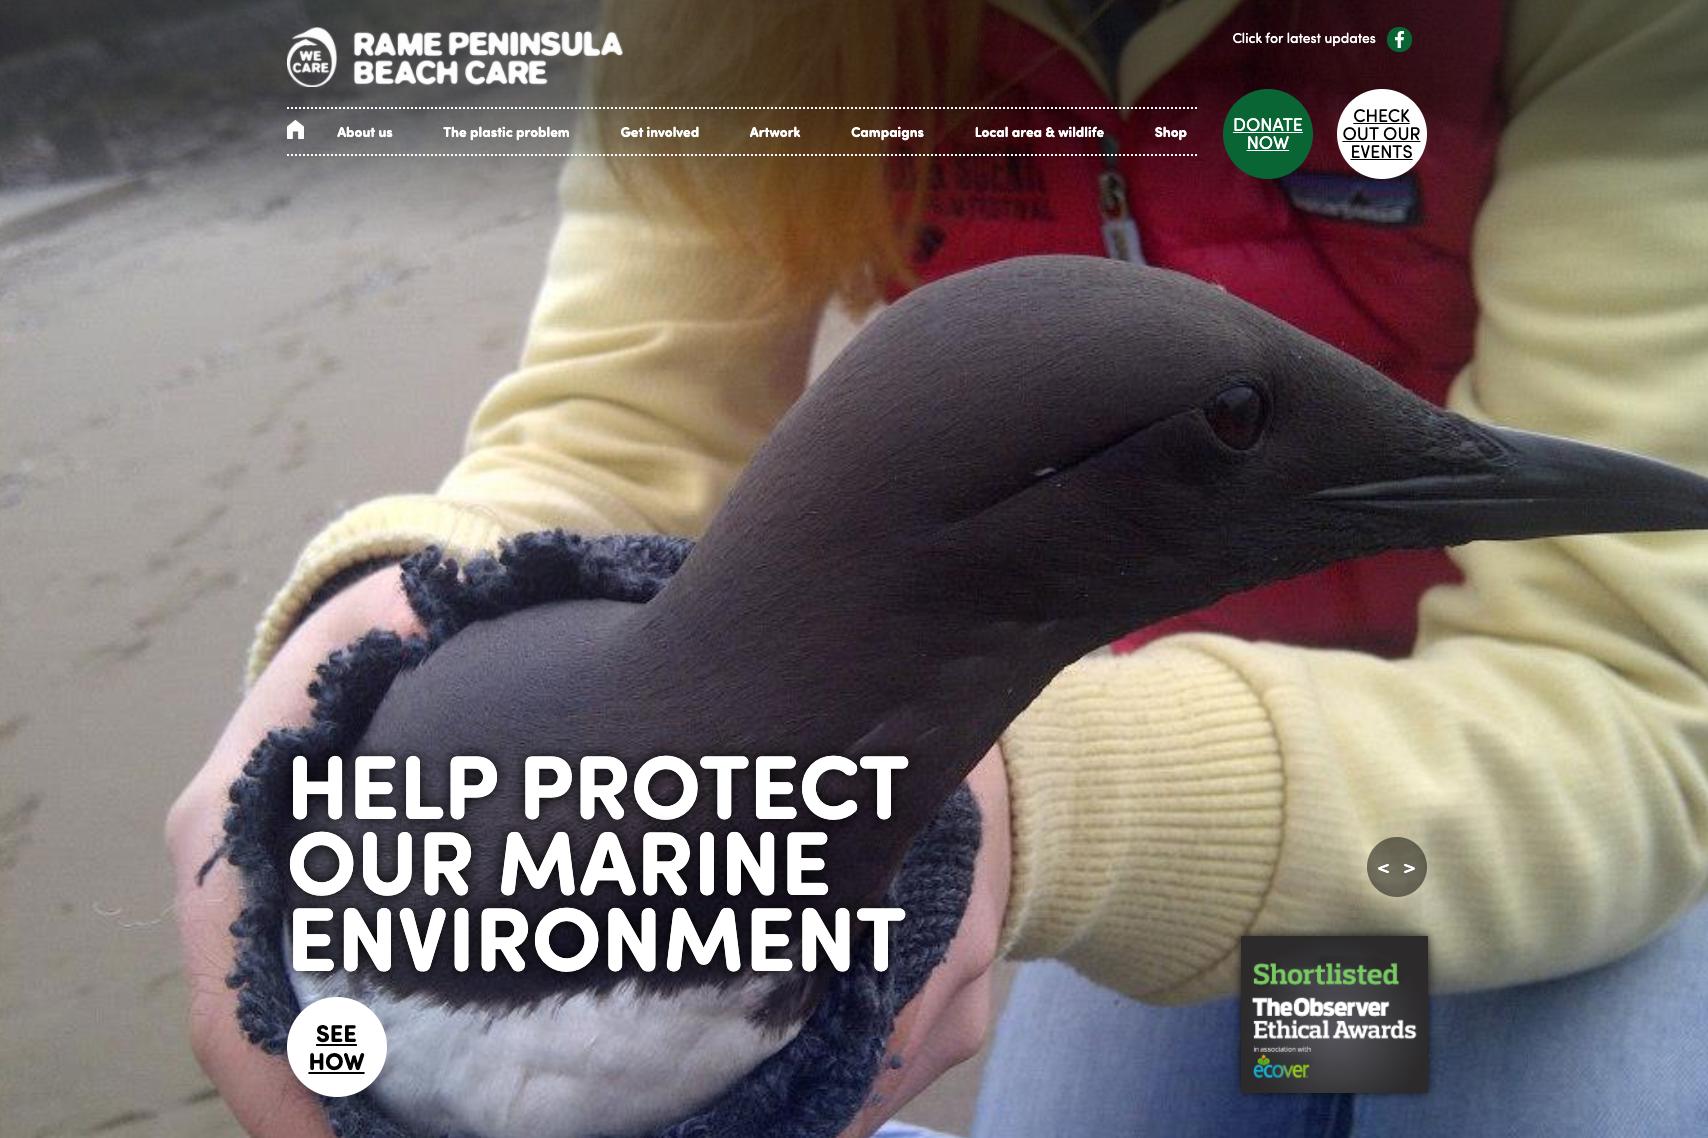 Rame Peninsula Beach Clean website image